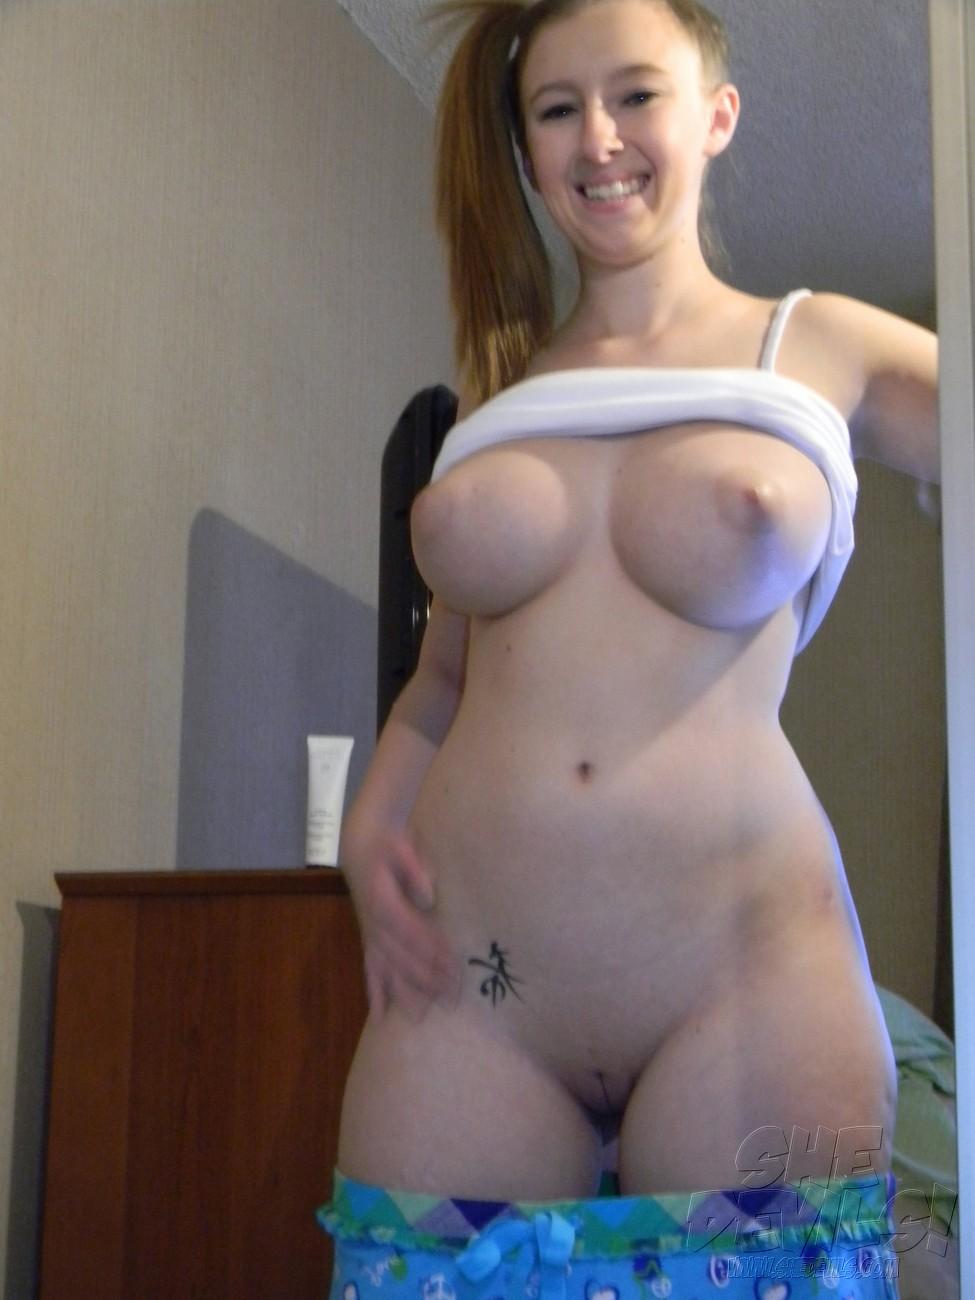 Think, busty curves felicia selfshot